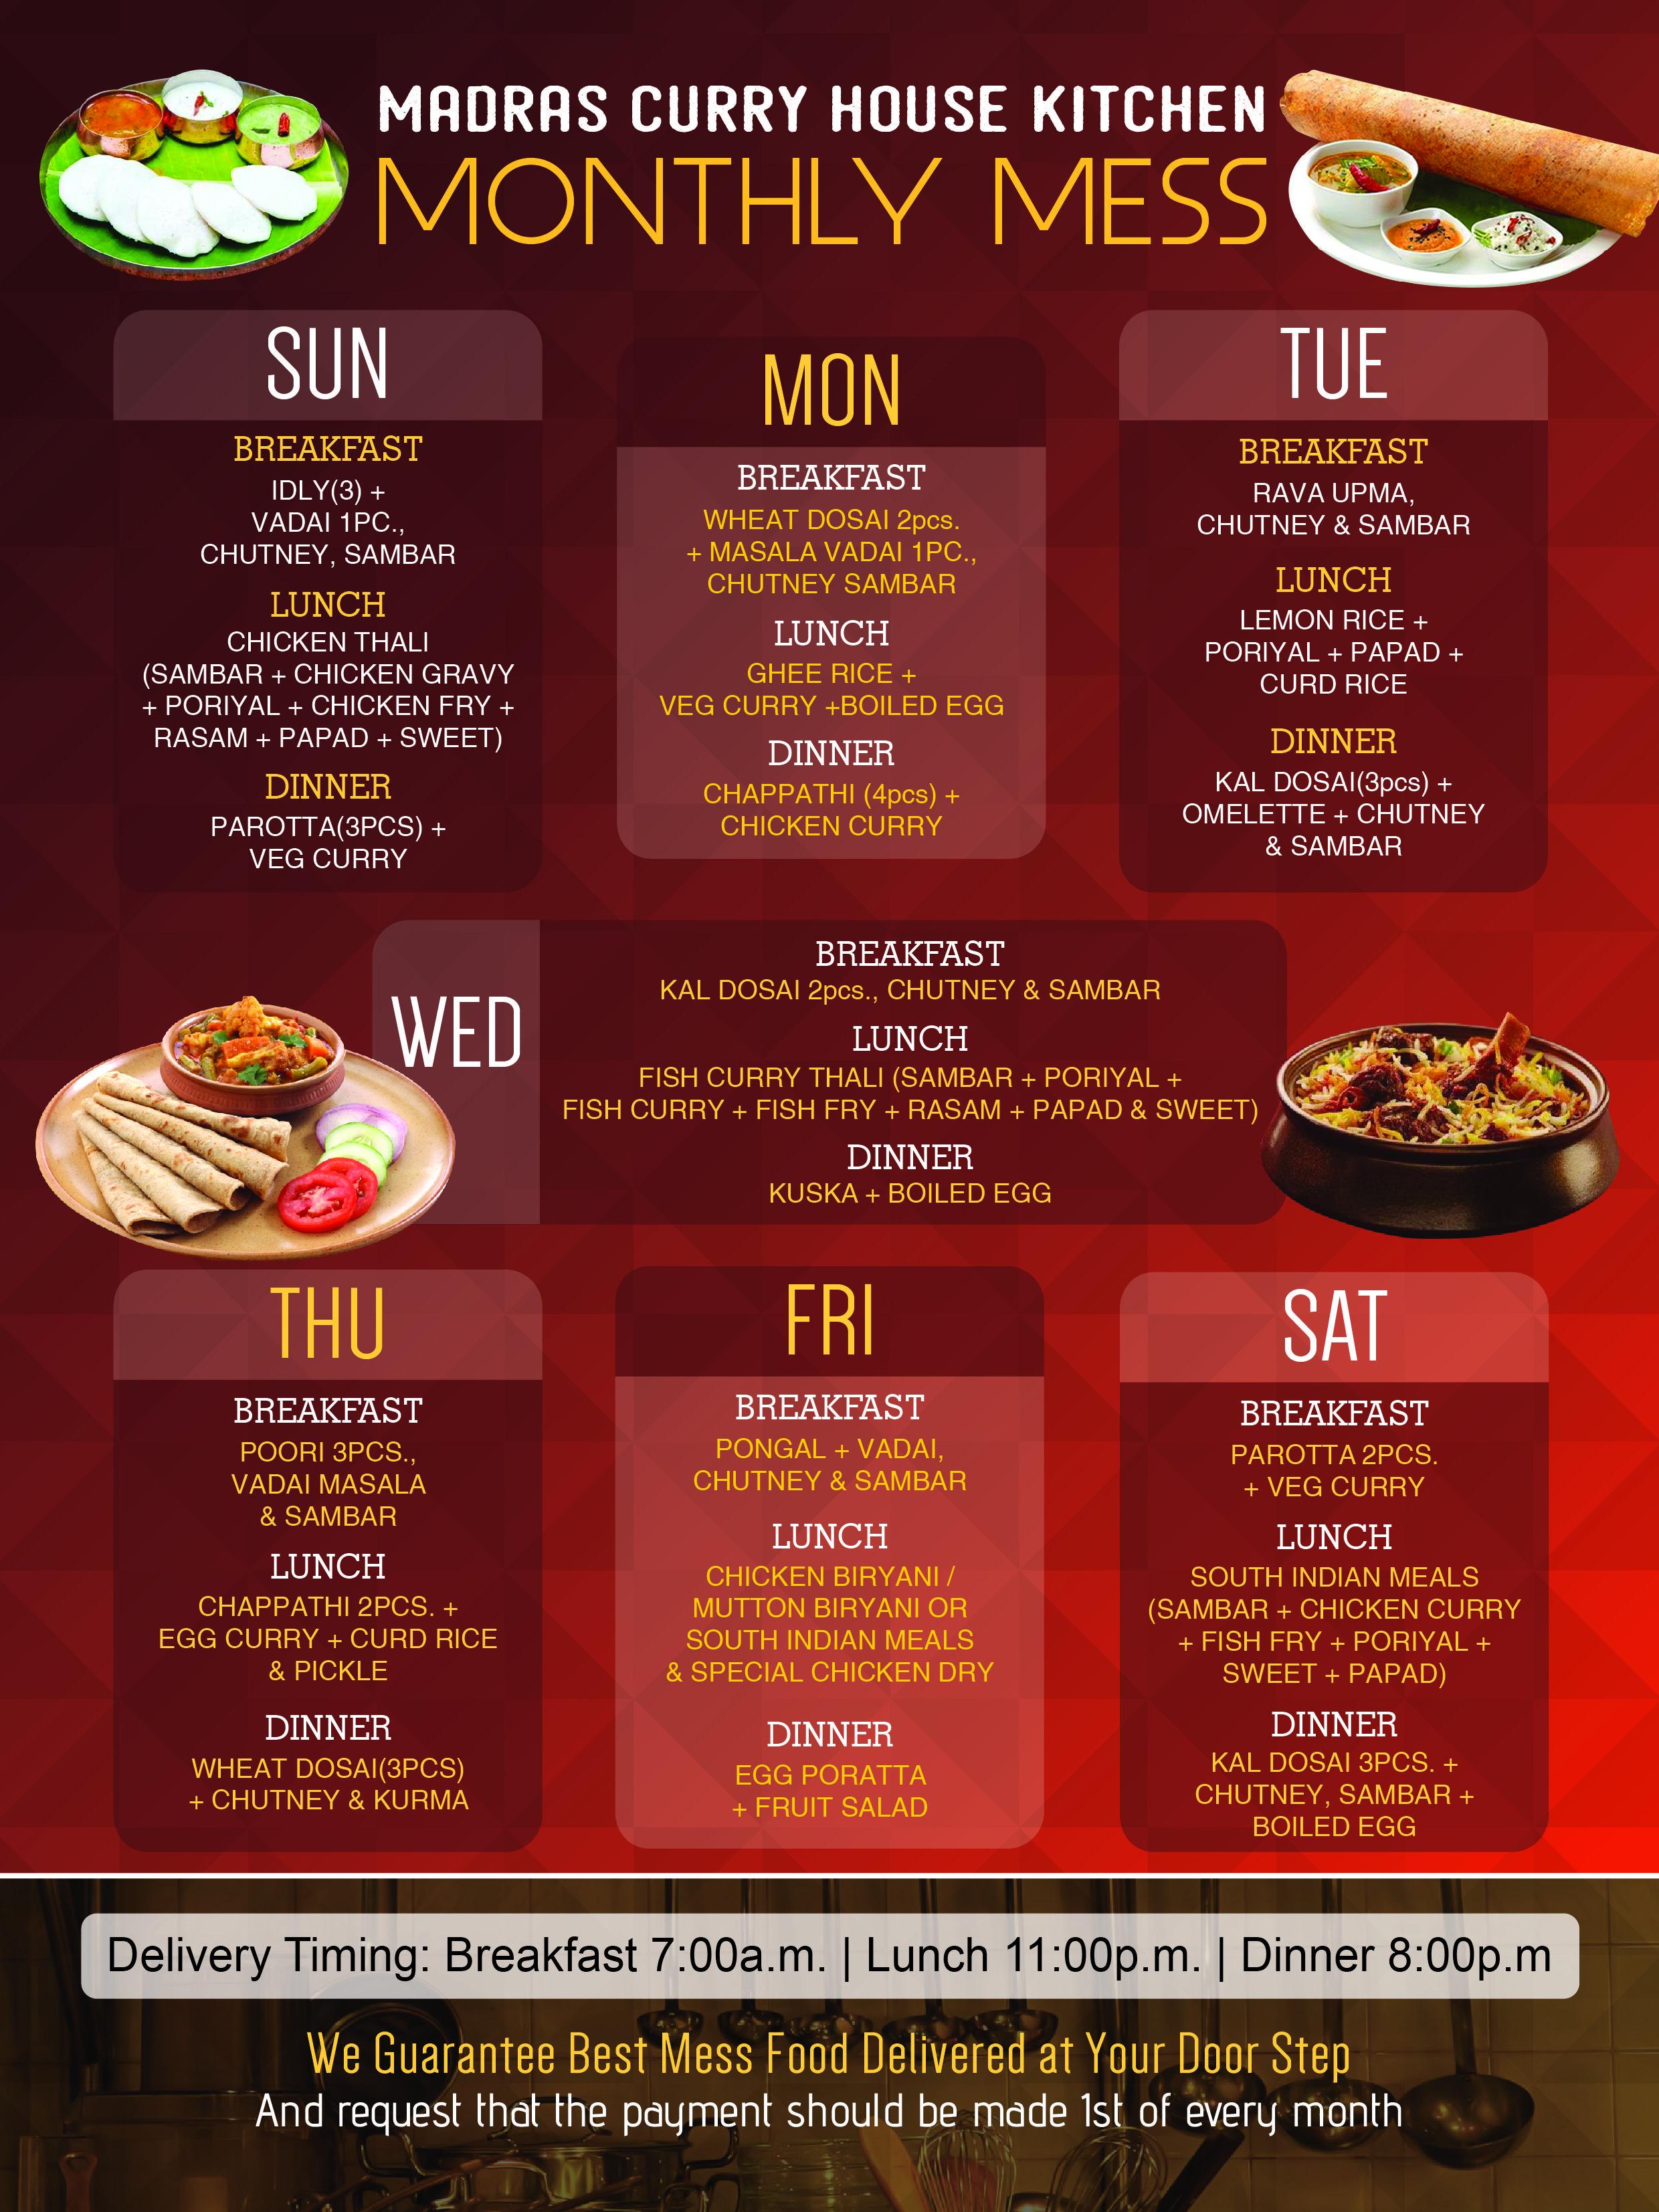 Monthly Mess Ajman Restaurant Veg Curry Breakfast Lunch Dinner Madras Curry